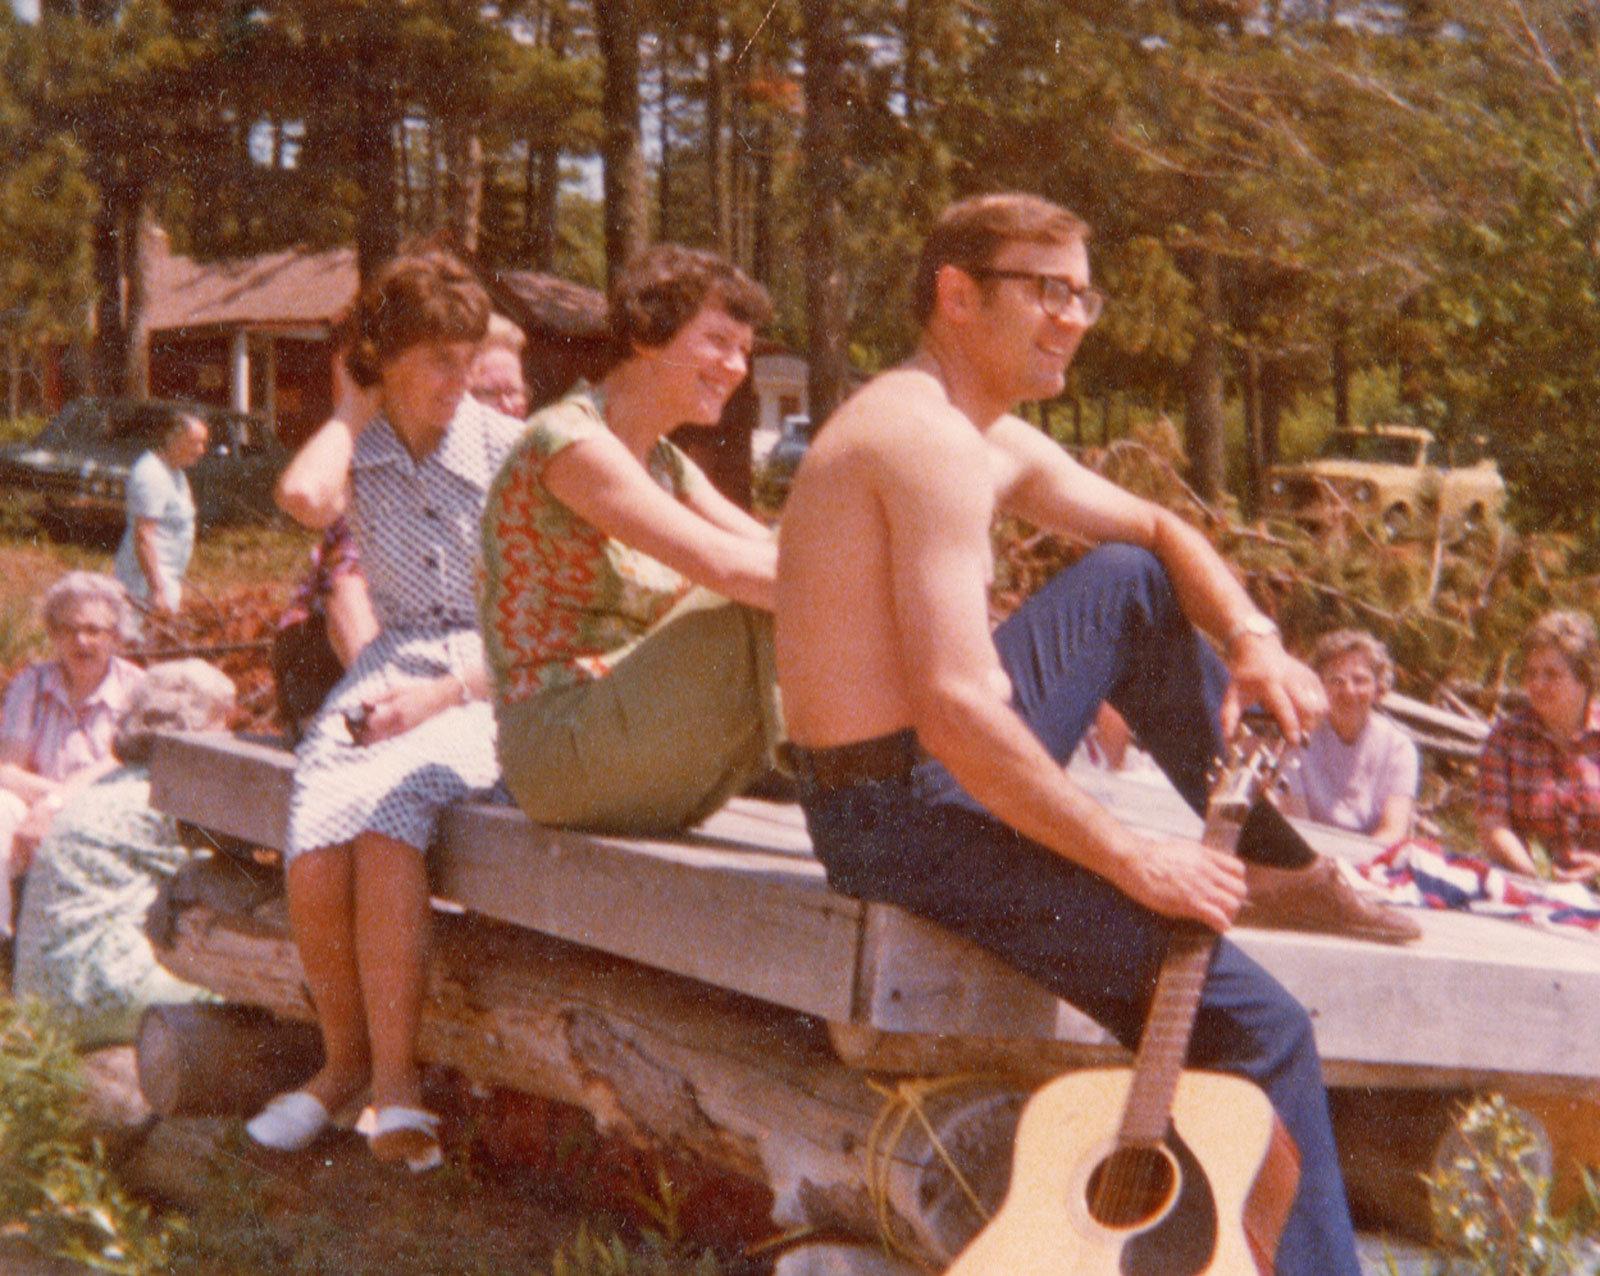 Lorraine McClelland, Val and Randy Fiegehan